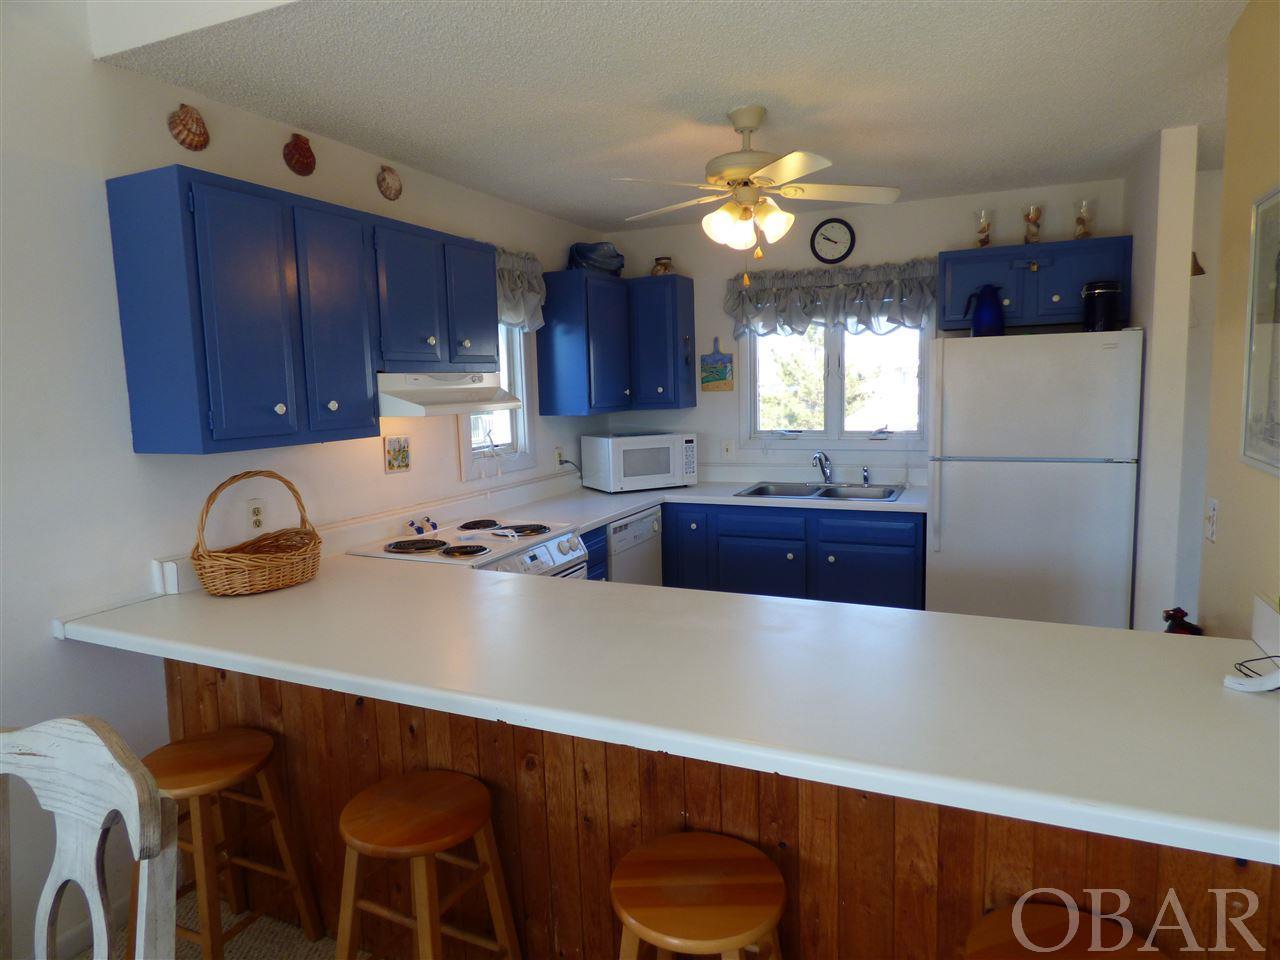 622 B Sand Fiddler Circle,Corolla,NC 27927,3 Bedrooms Bedrooms,2 BathroomsBathrooms,Residential,Sand Fiddler Circle,95143